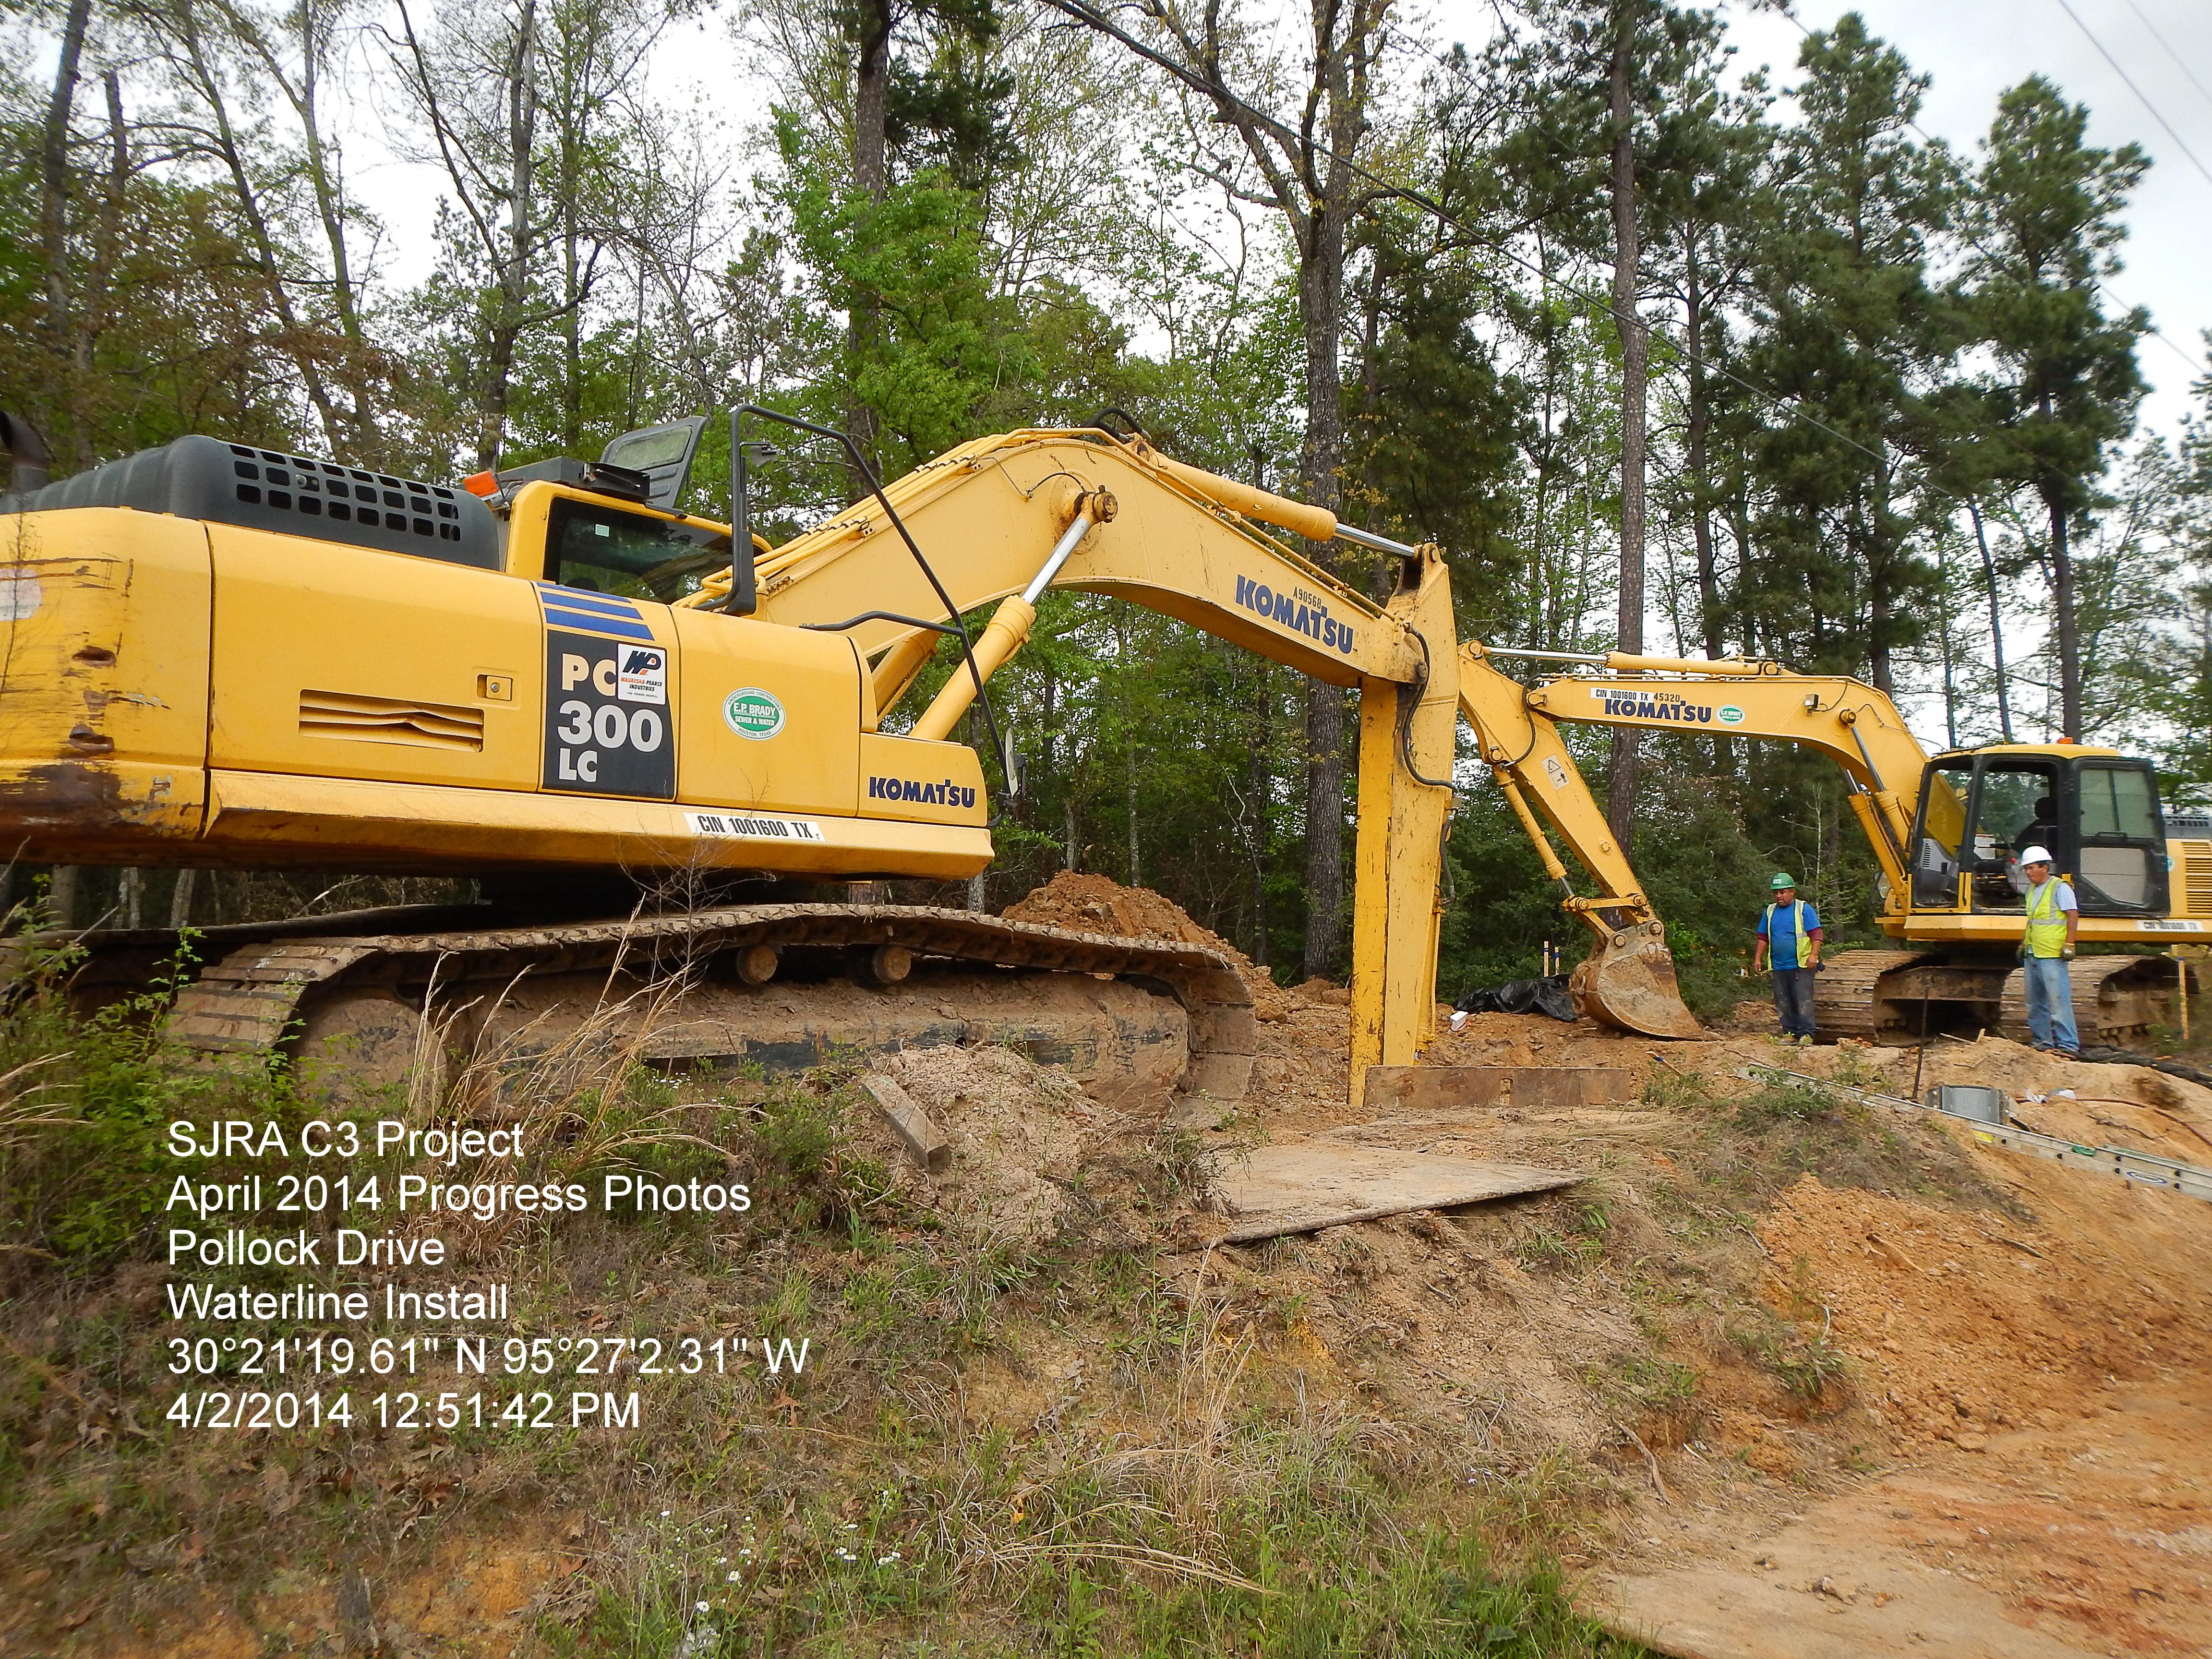 More Excavators